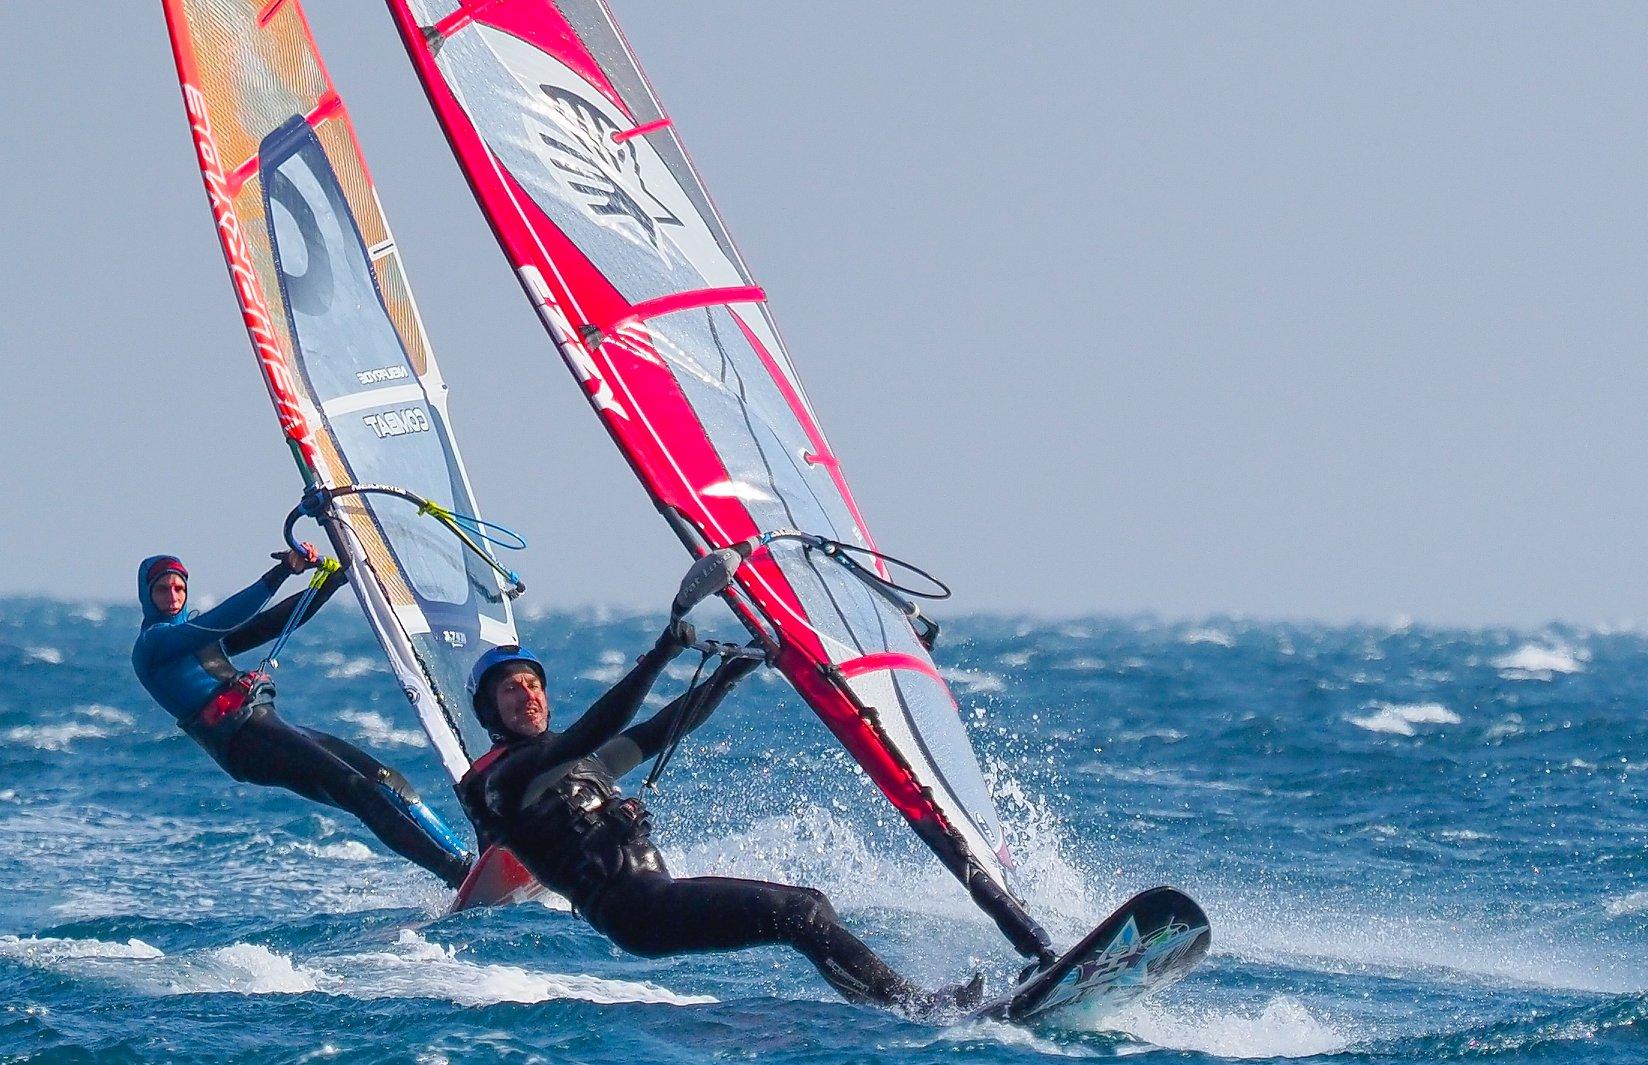 Windsurf_Noli_Marco_ed_IO_2018-05-30.jpg